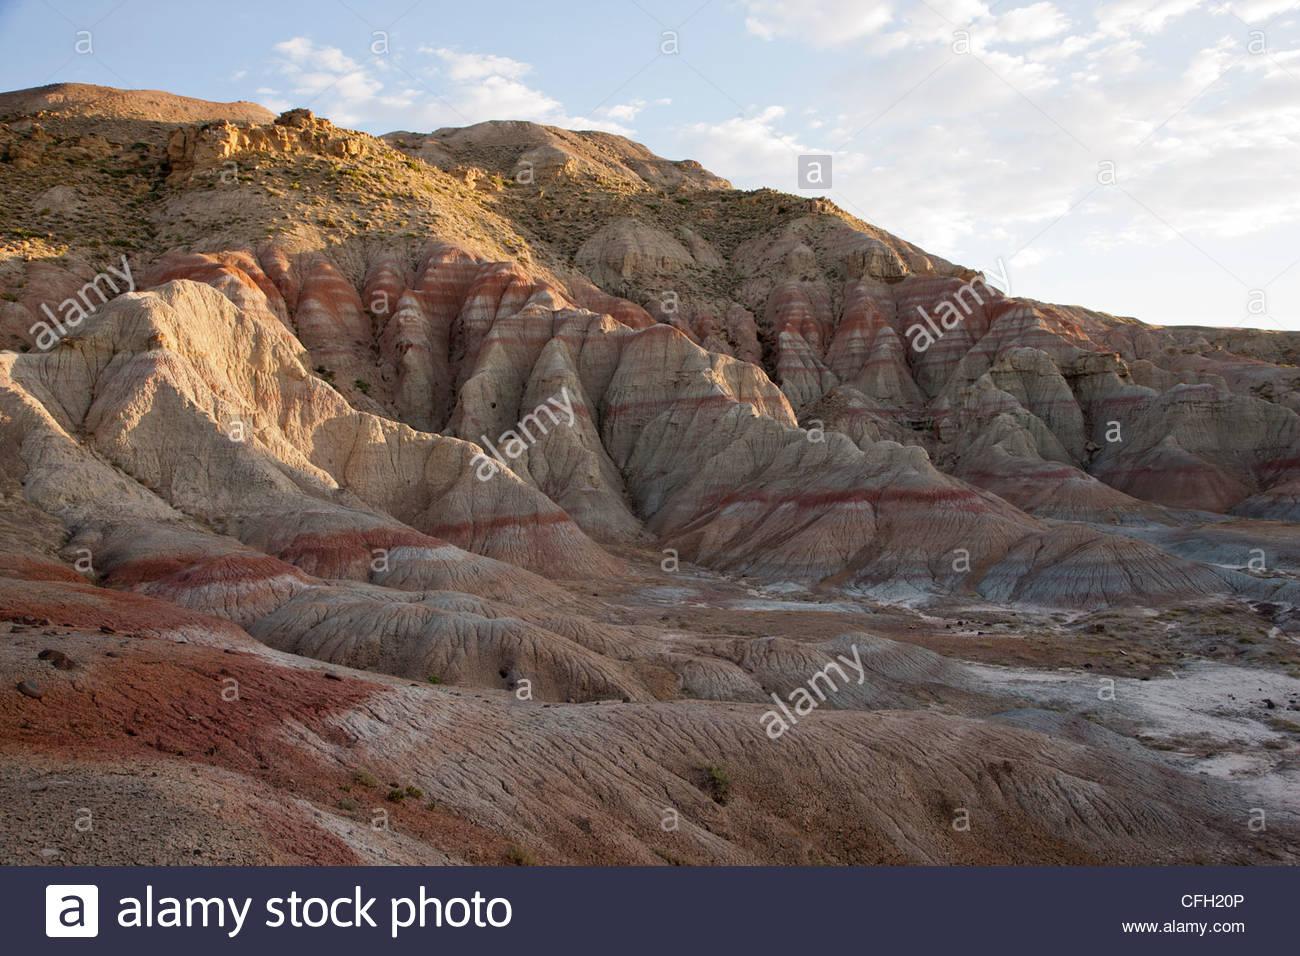 Red rust bands of oxidized soil mark the Paleocene Eocene Thermal Maximum. - Stock Image